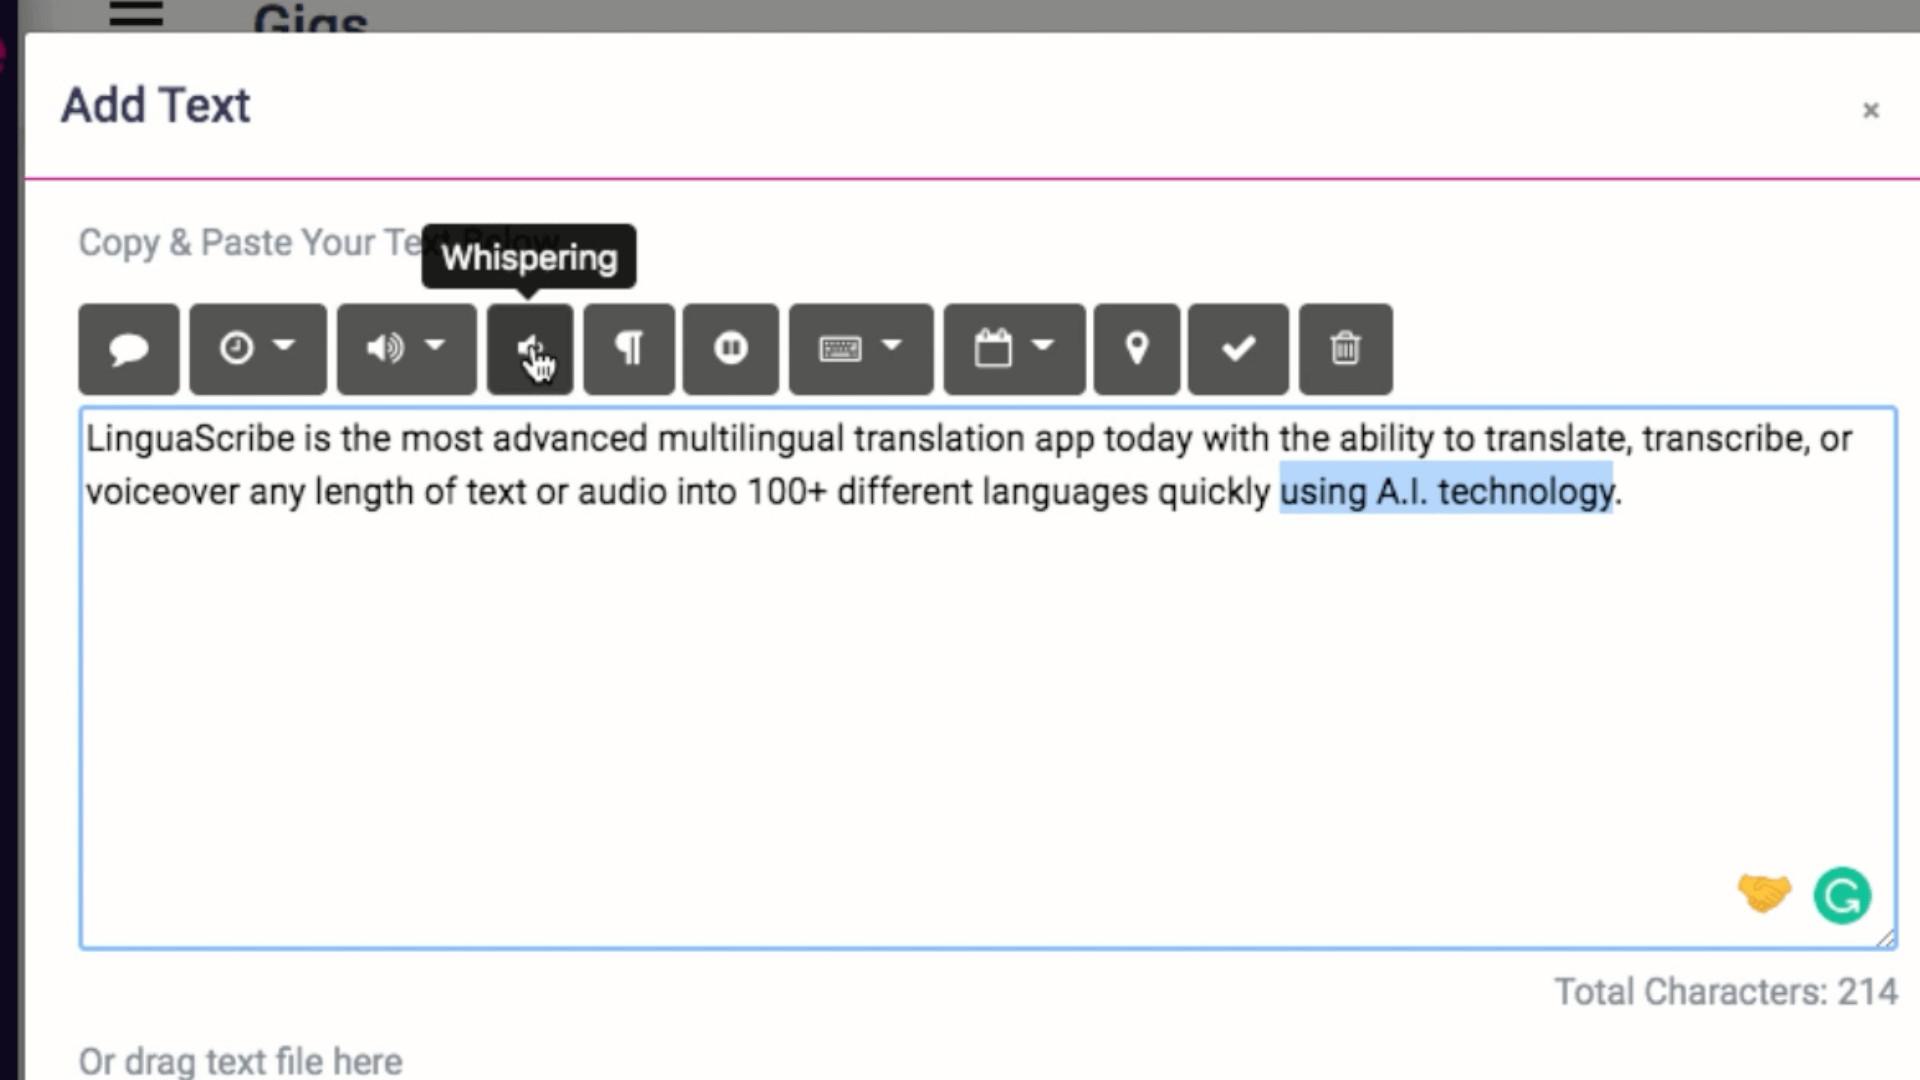 LinguaScribe-feature-5